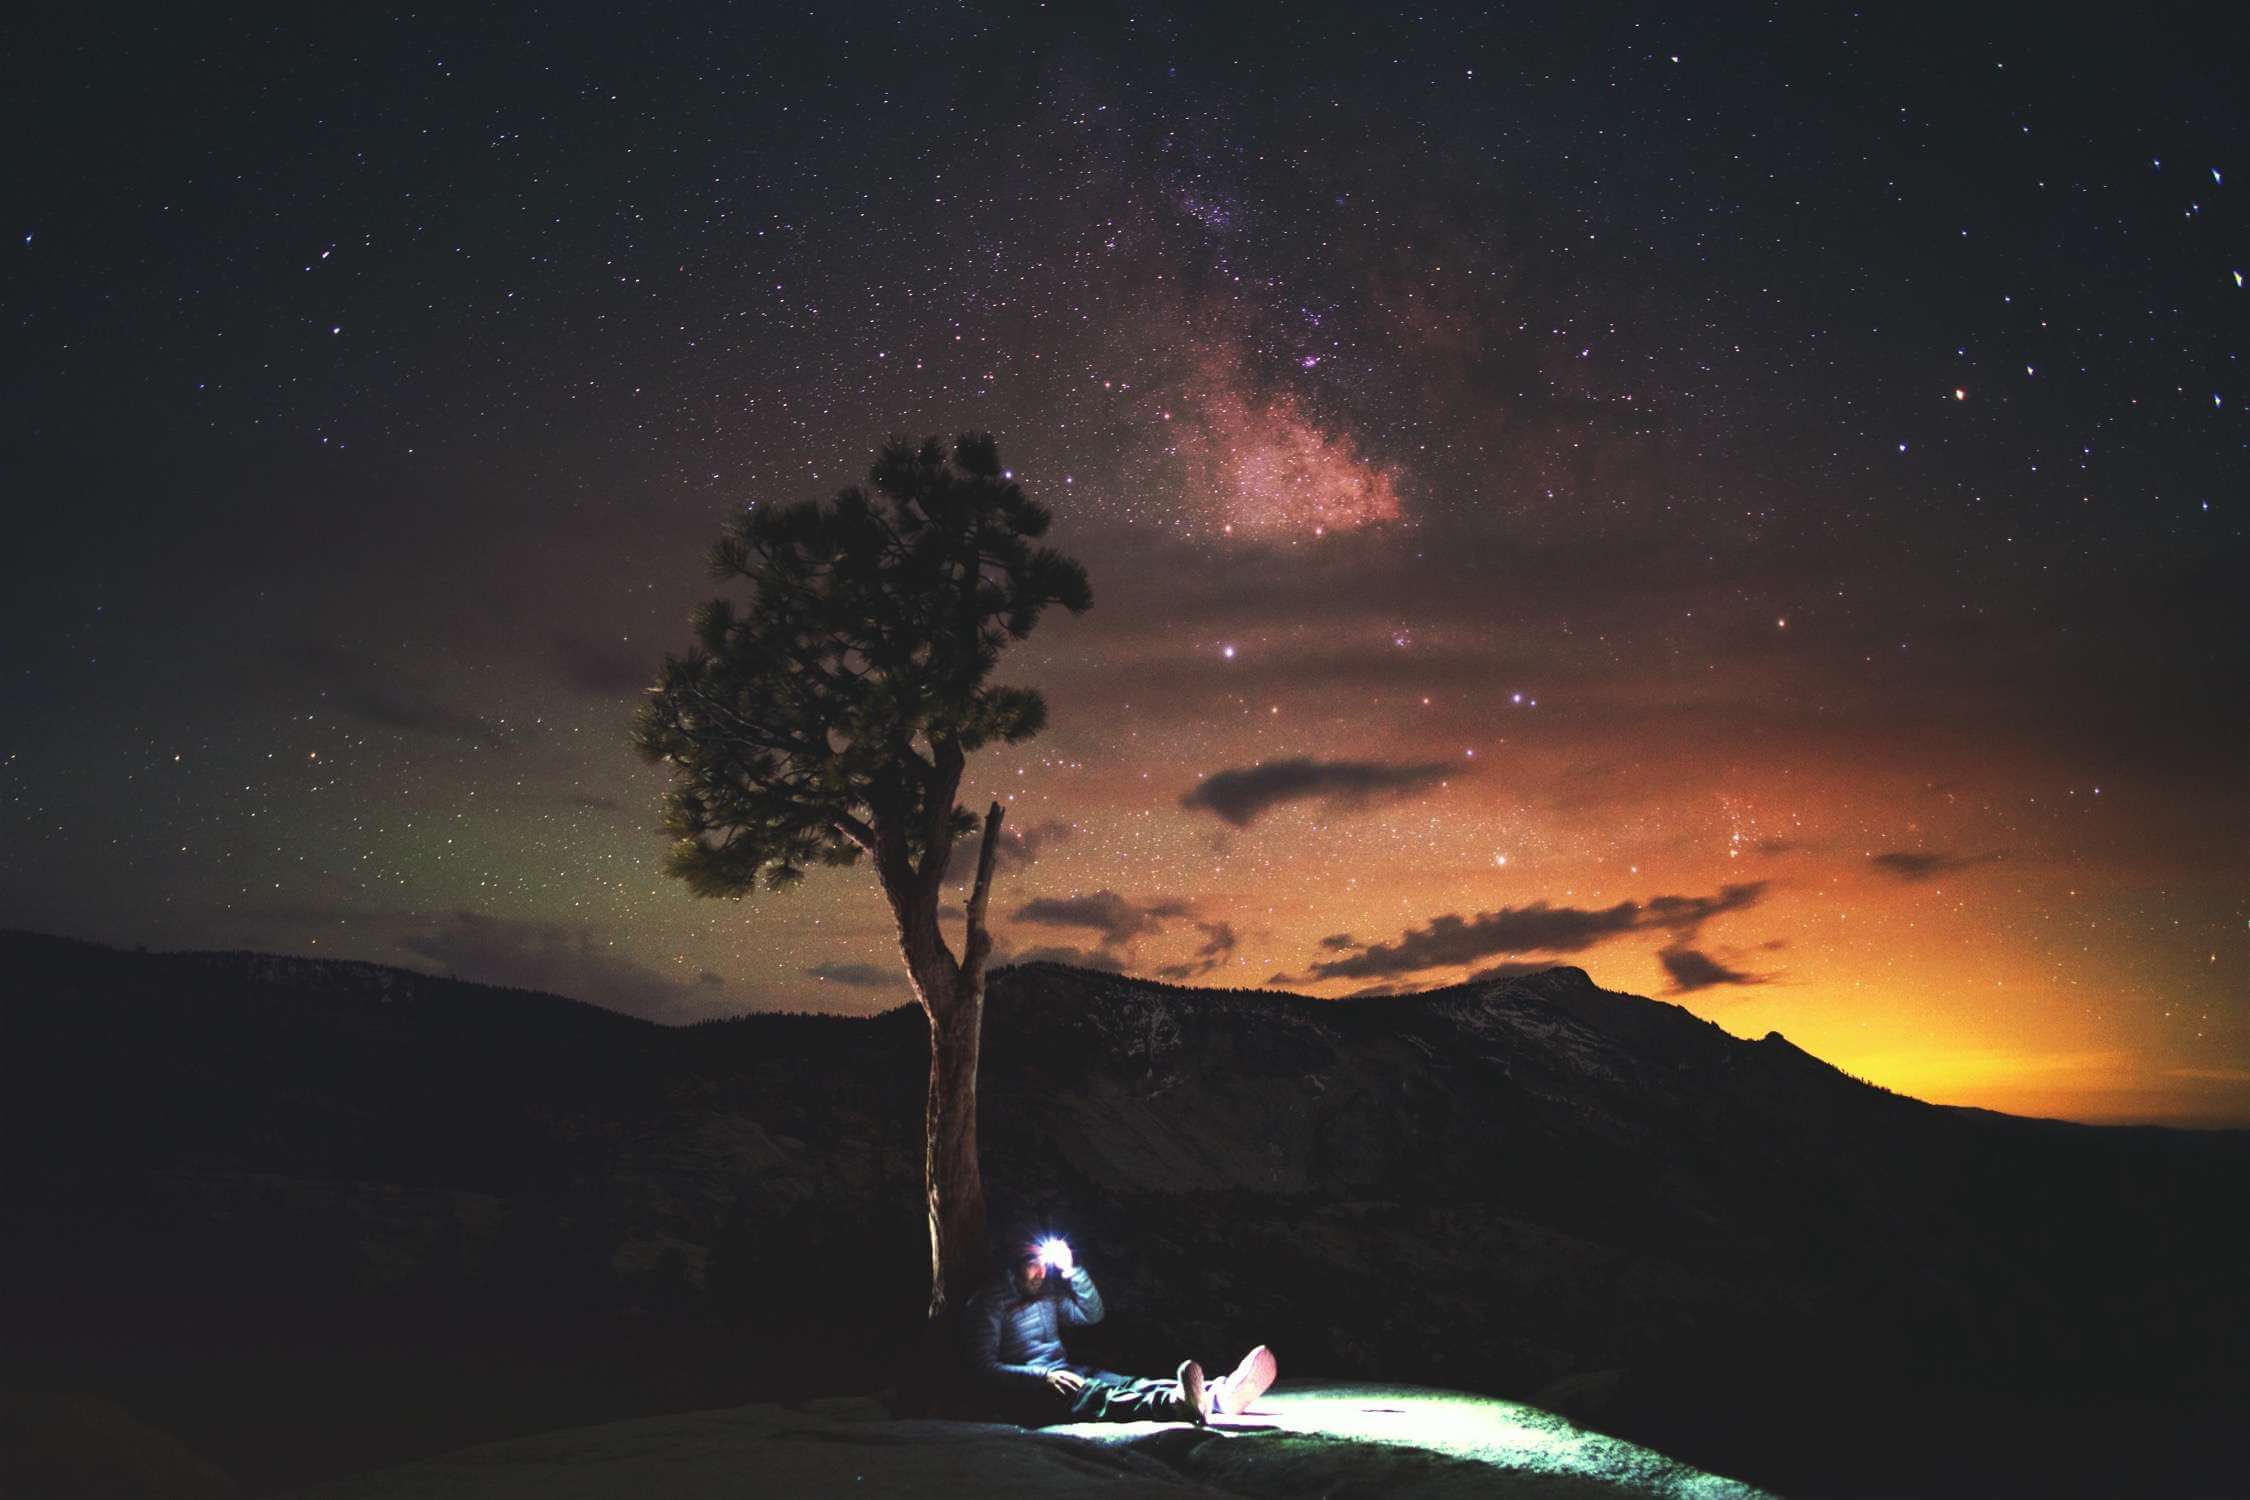 HMVFGQY - Silent Night